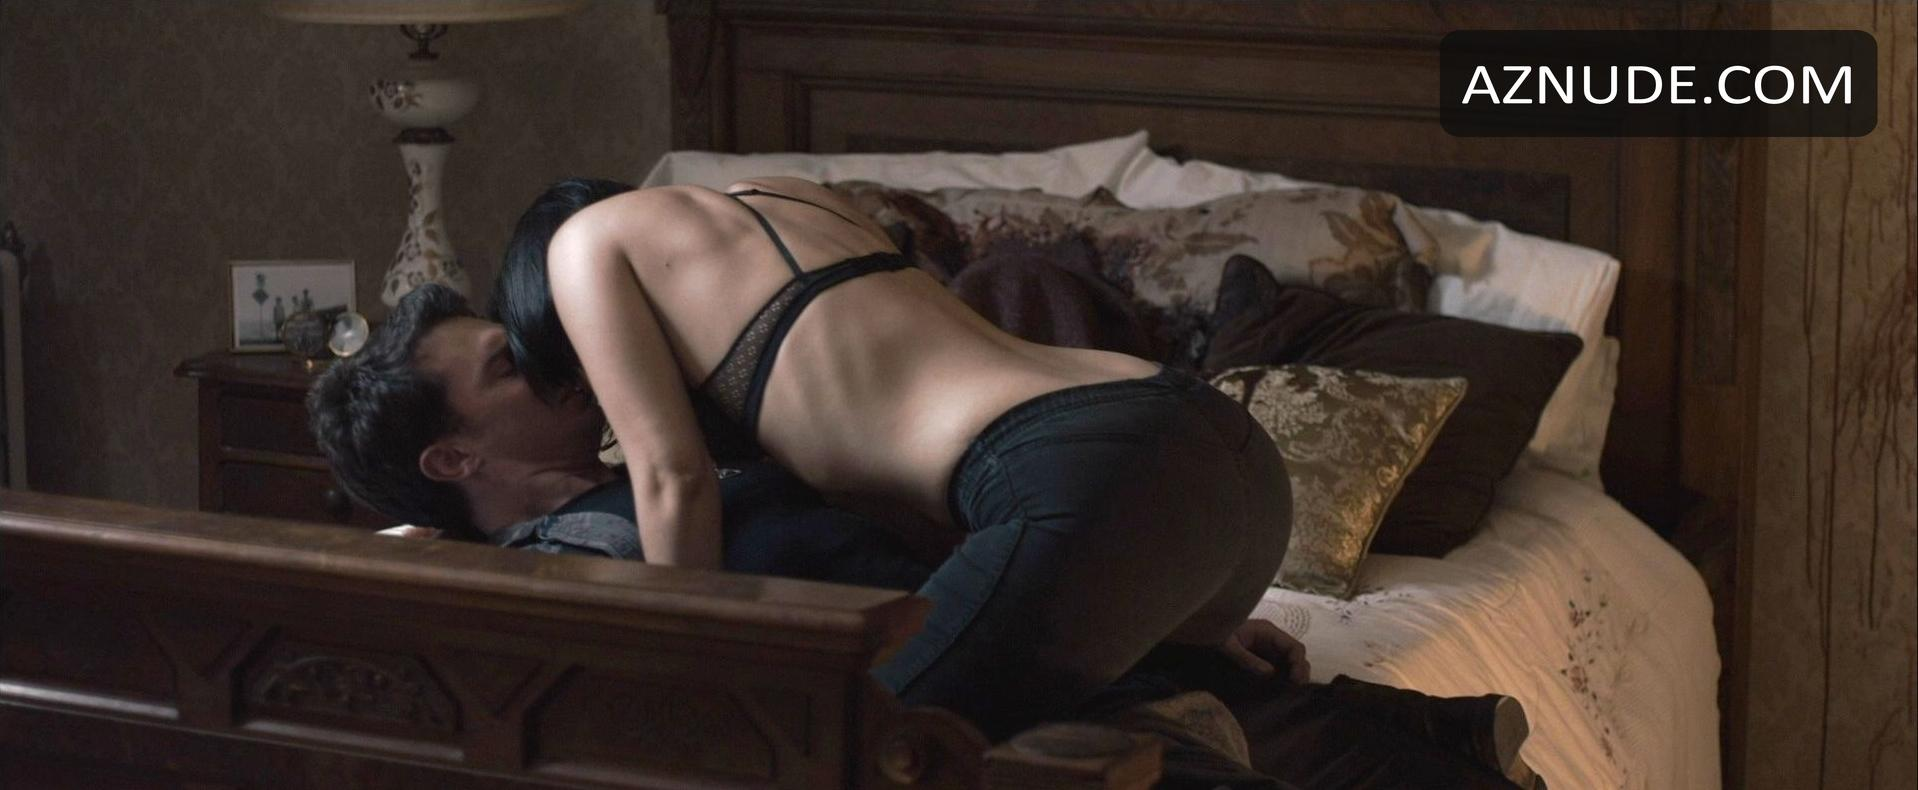 Drew barrymore sex vedios